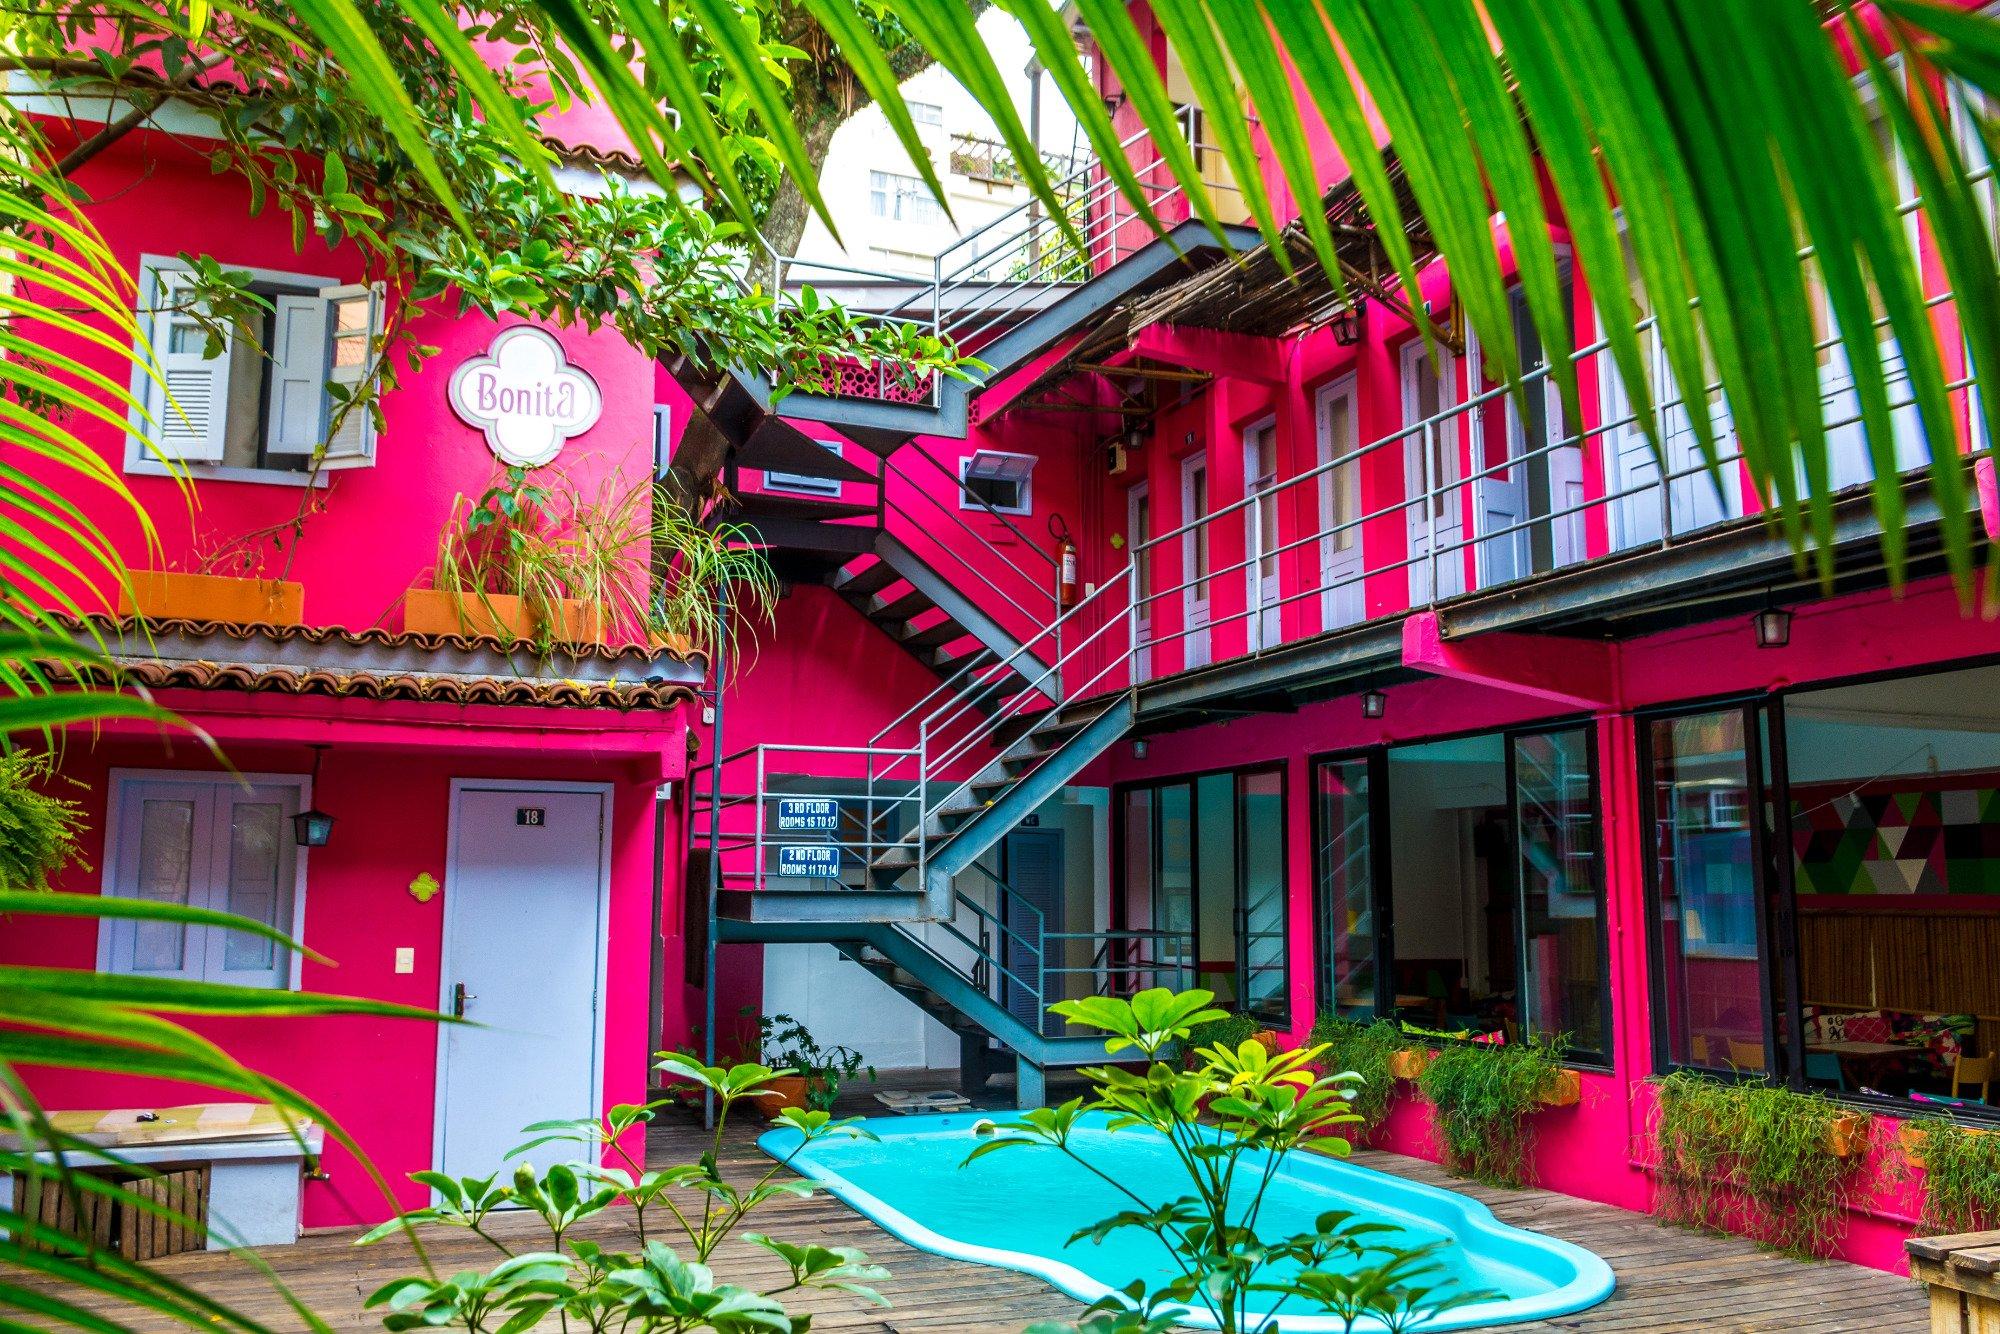 Bonita Ipanema Pousada & Hostel